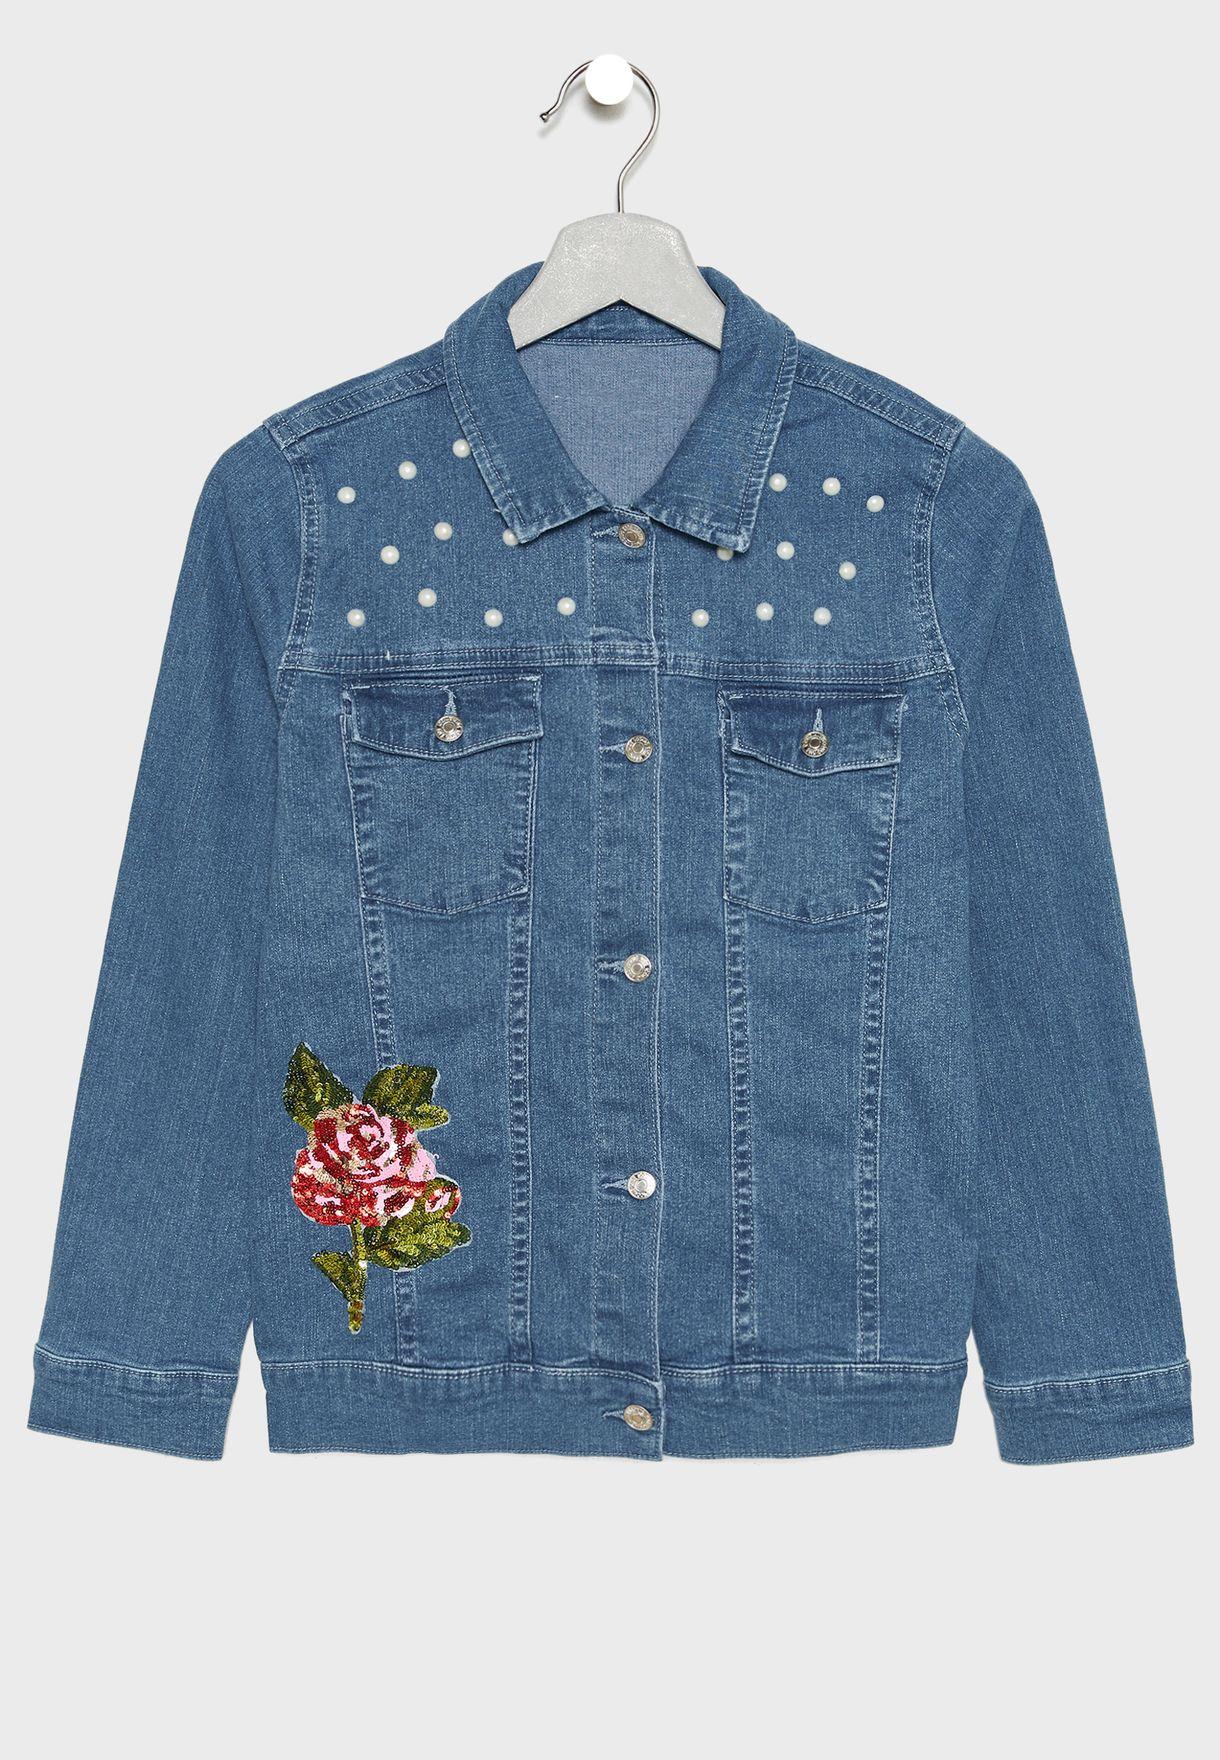 Kids Embroidered Denim Jacket